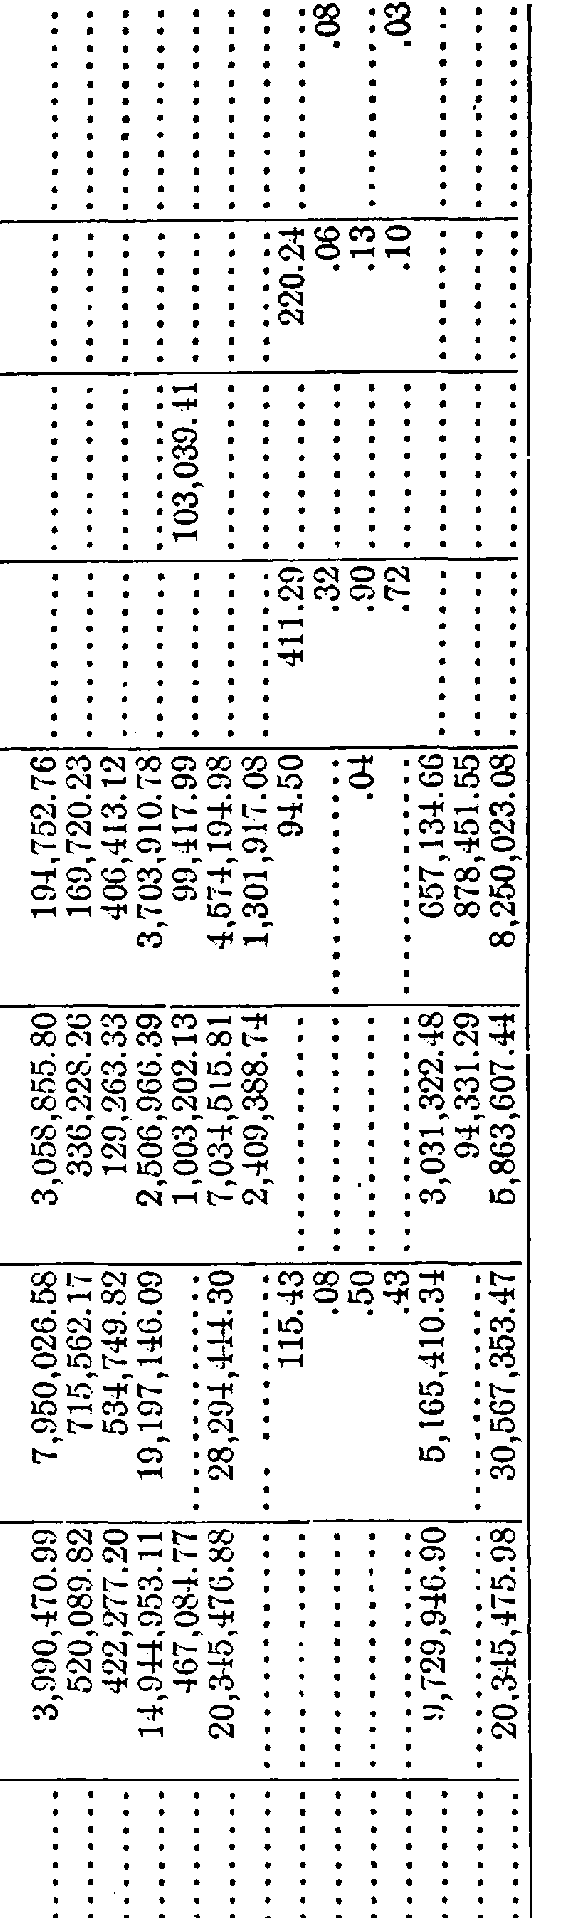 [merged small][merged small][merged small][merged small][merged small][merged small][merged small][merged small][merged small][ocr errors][merged small][merged small][merged small][merged small][merged small]